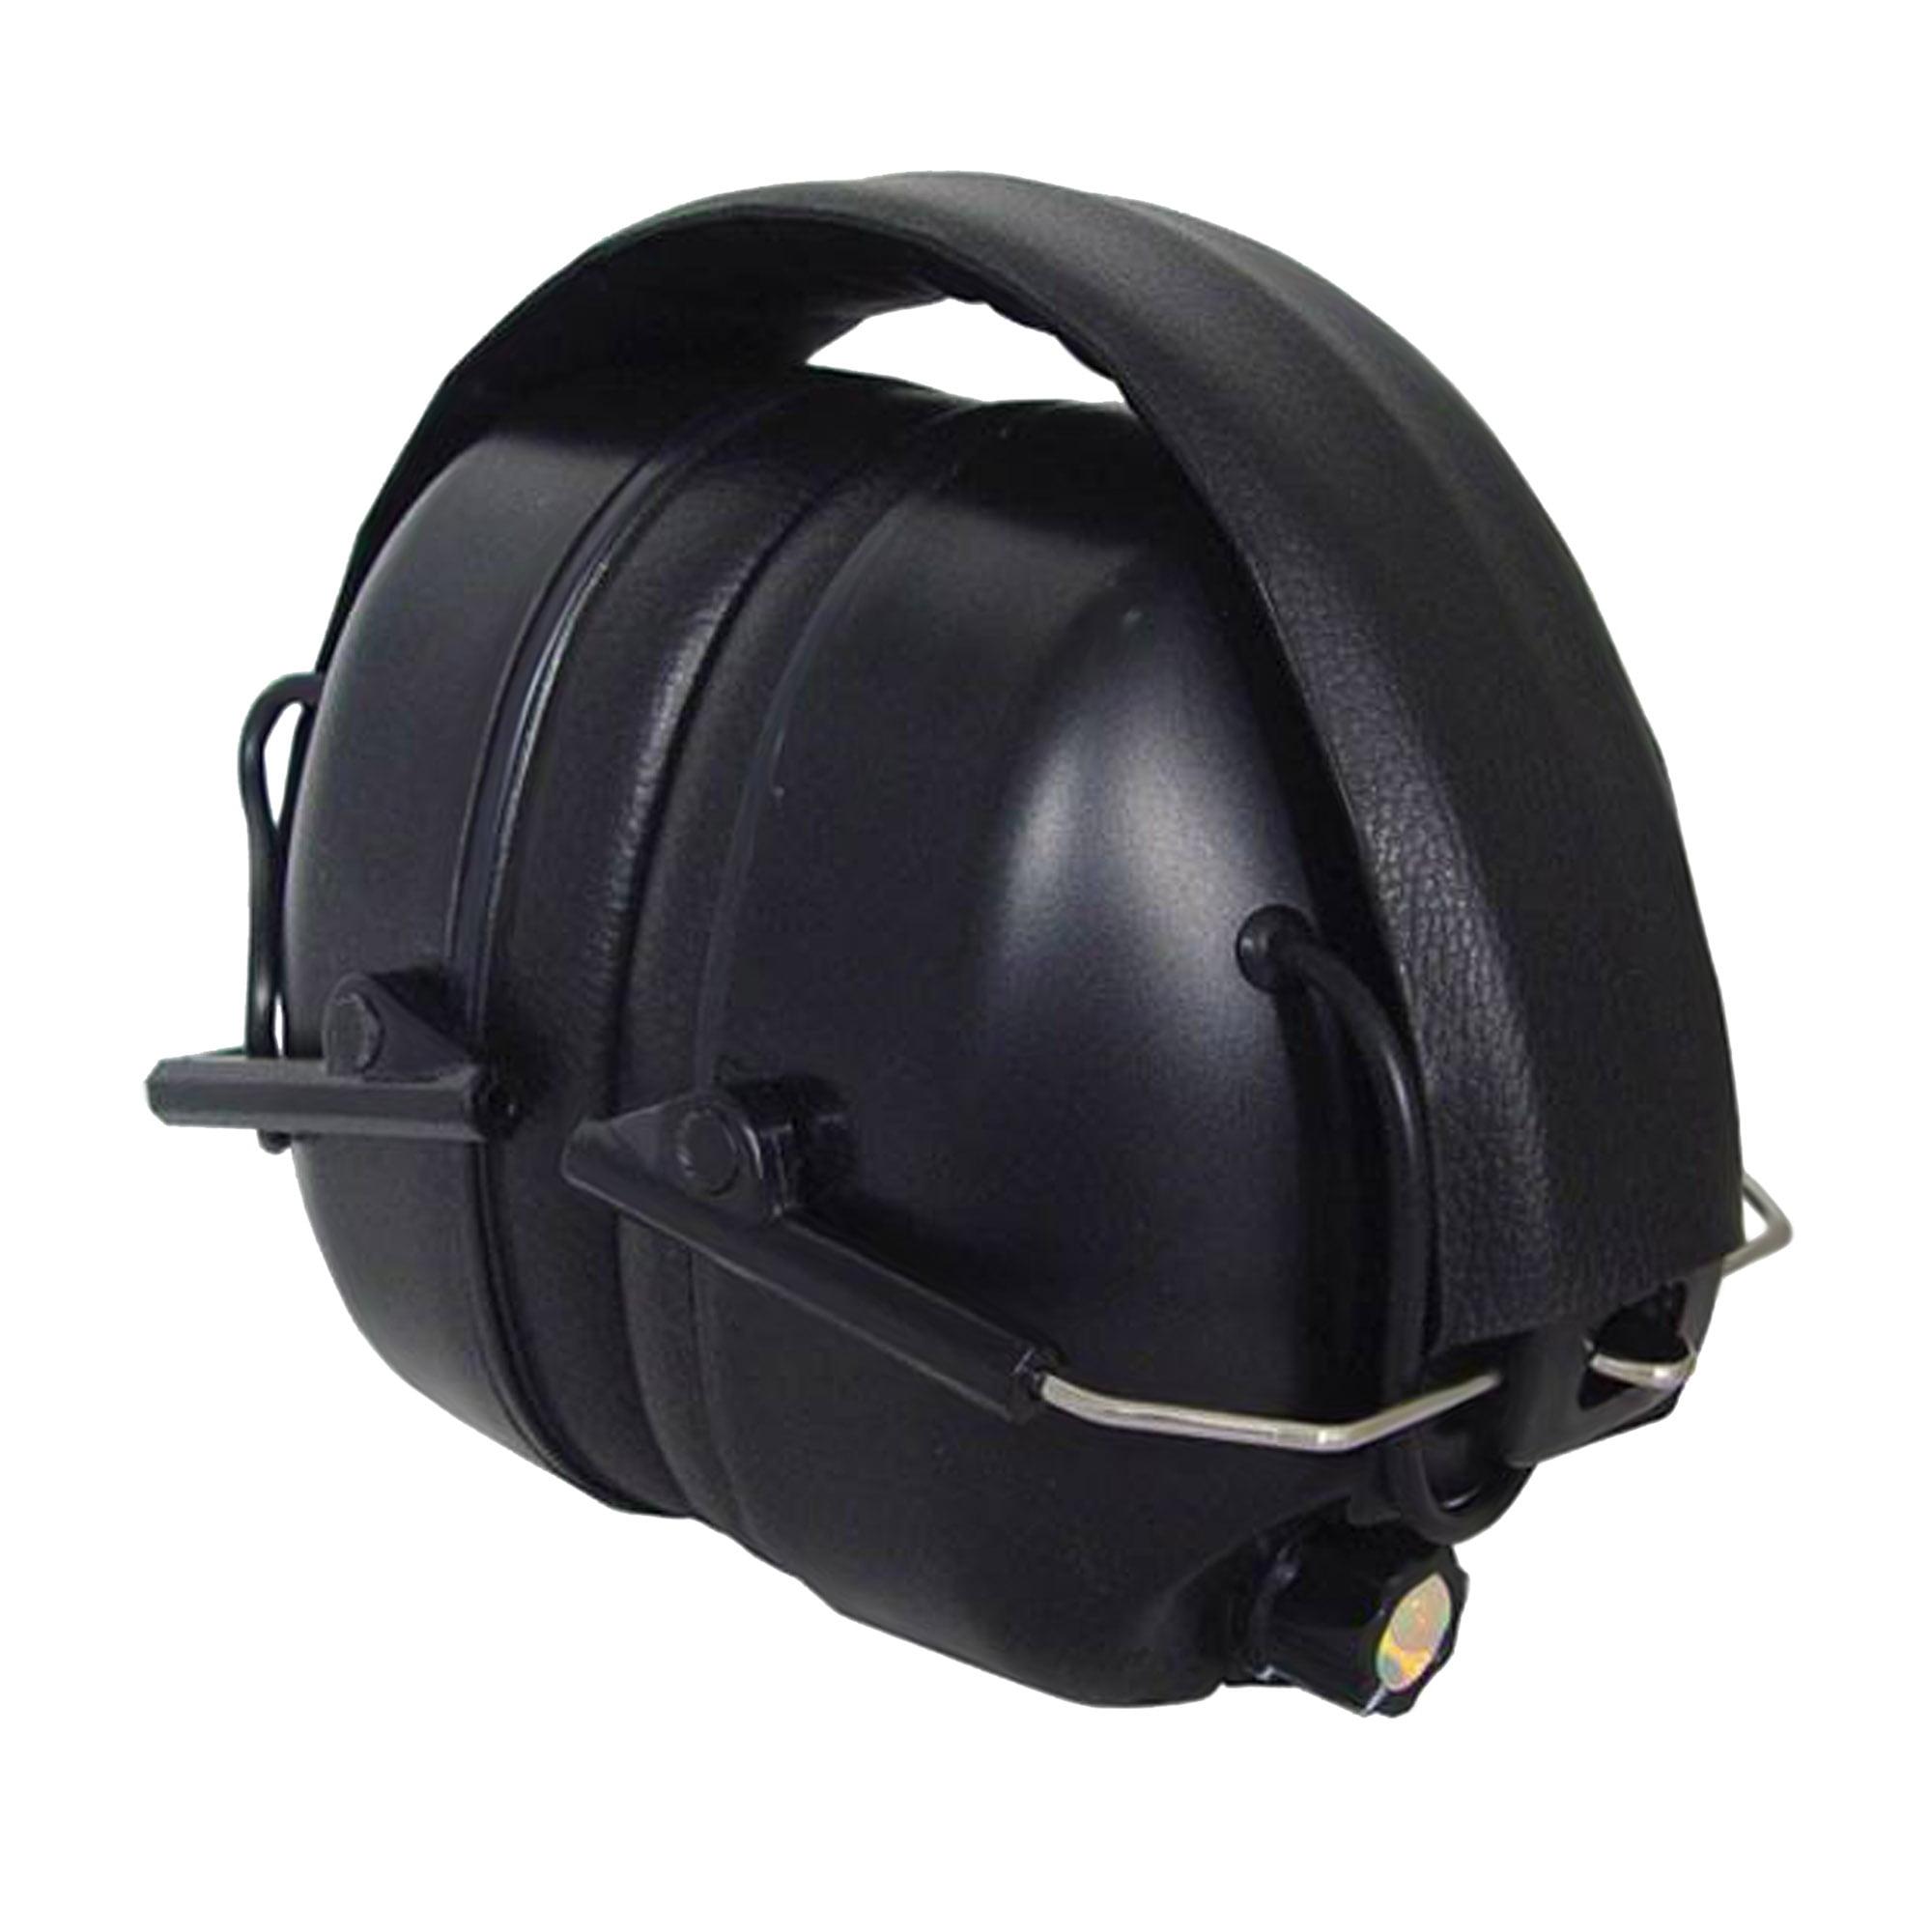 RADIANS 430 ELECTRONIC EARMUFF 27 DB BLACK